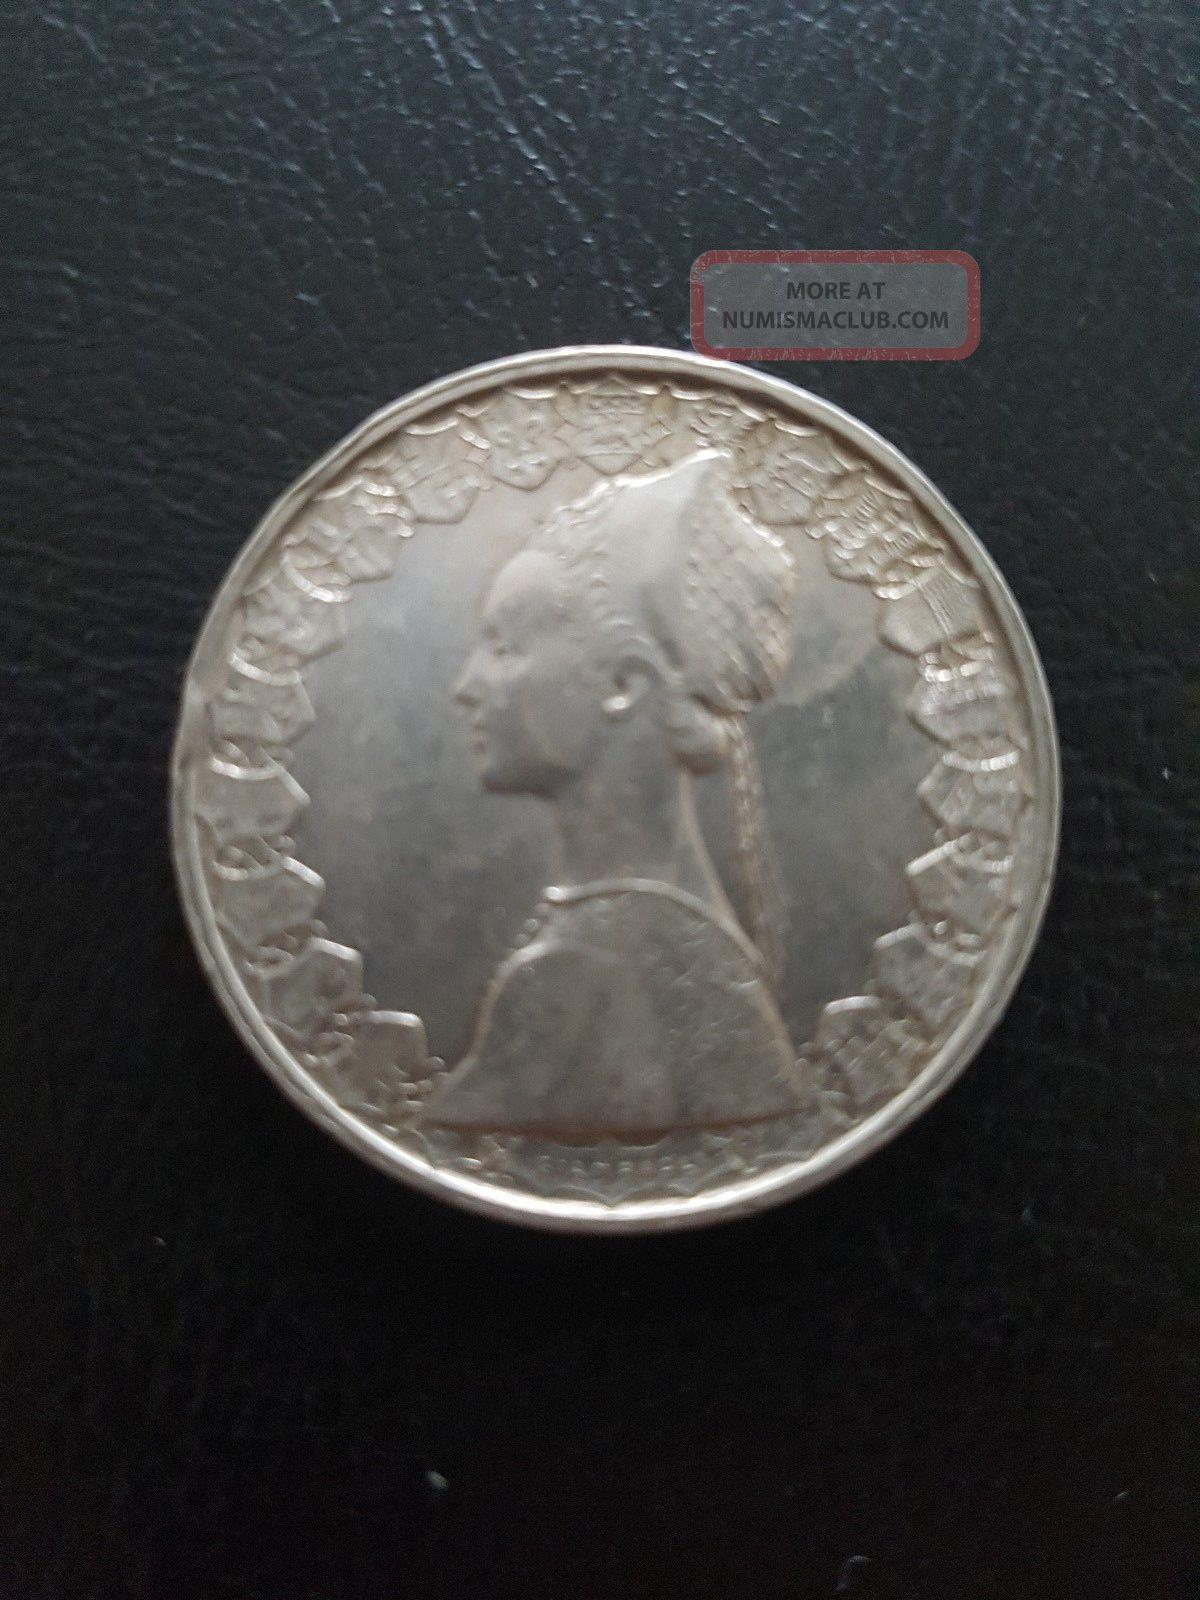 500 Lire Silver Italian Coin 1959 Italy, San Marino, Vatican photo